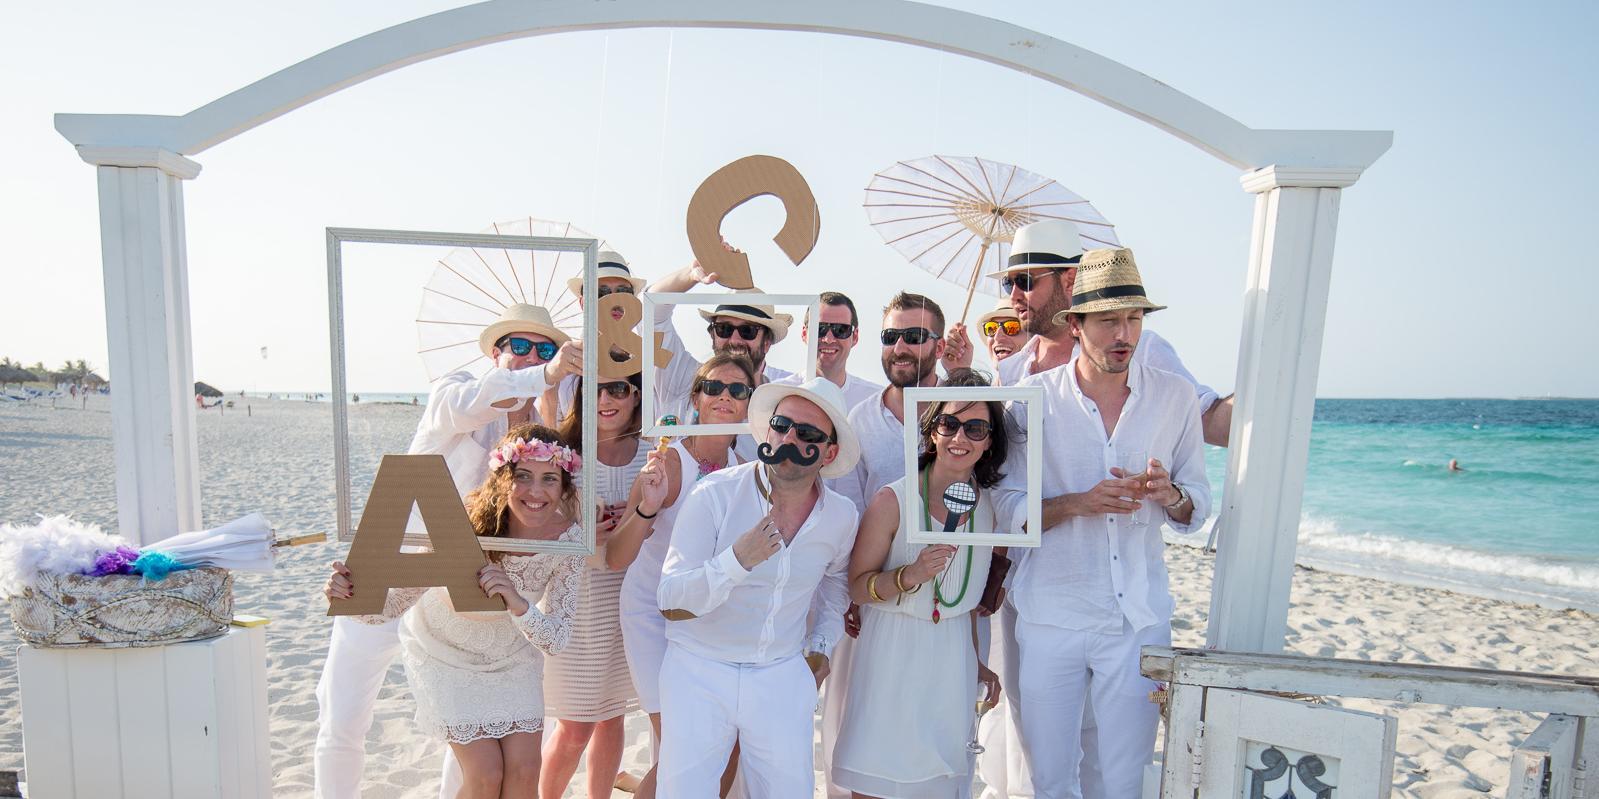 bodas-rustico-playa-cuba-6521.jpg